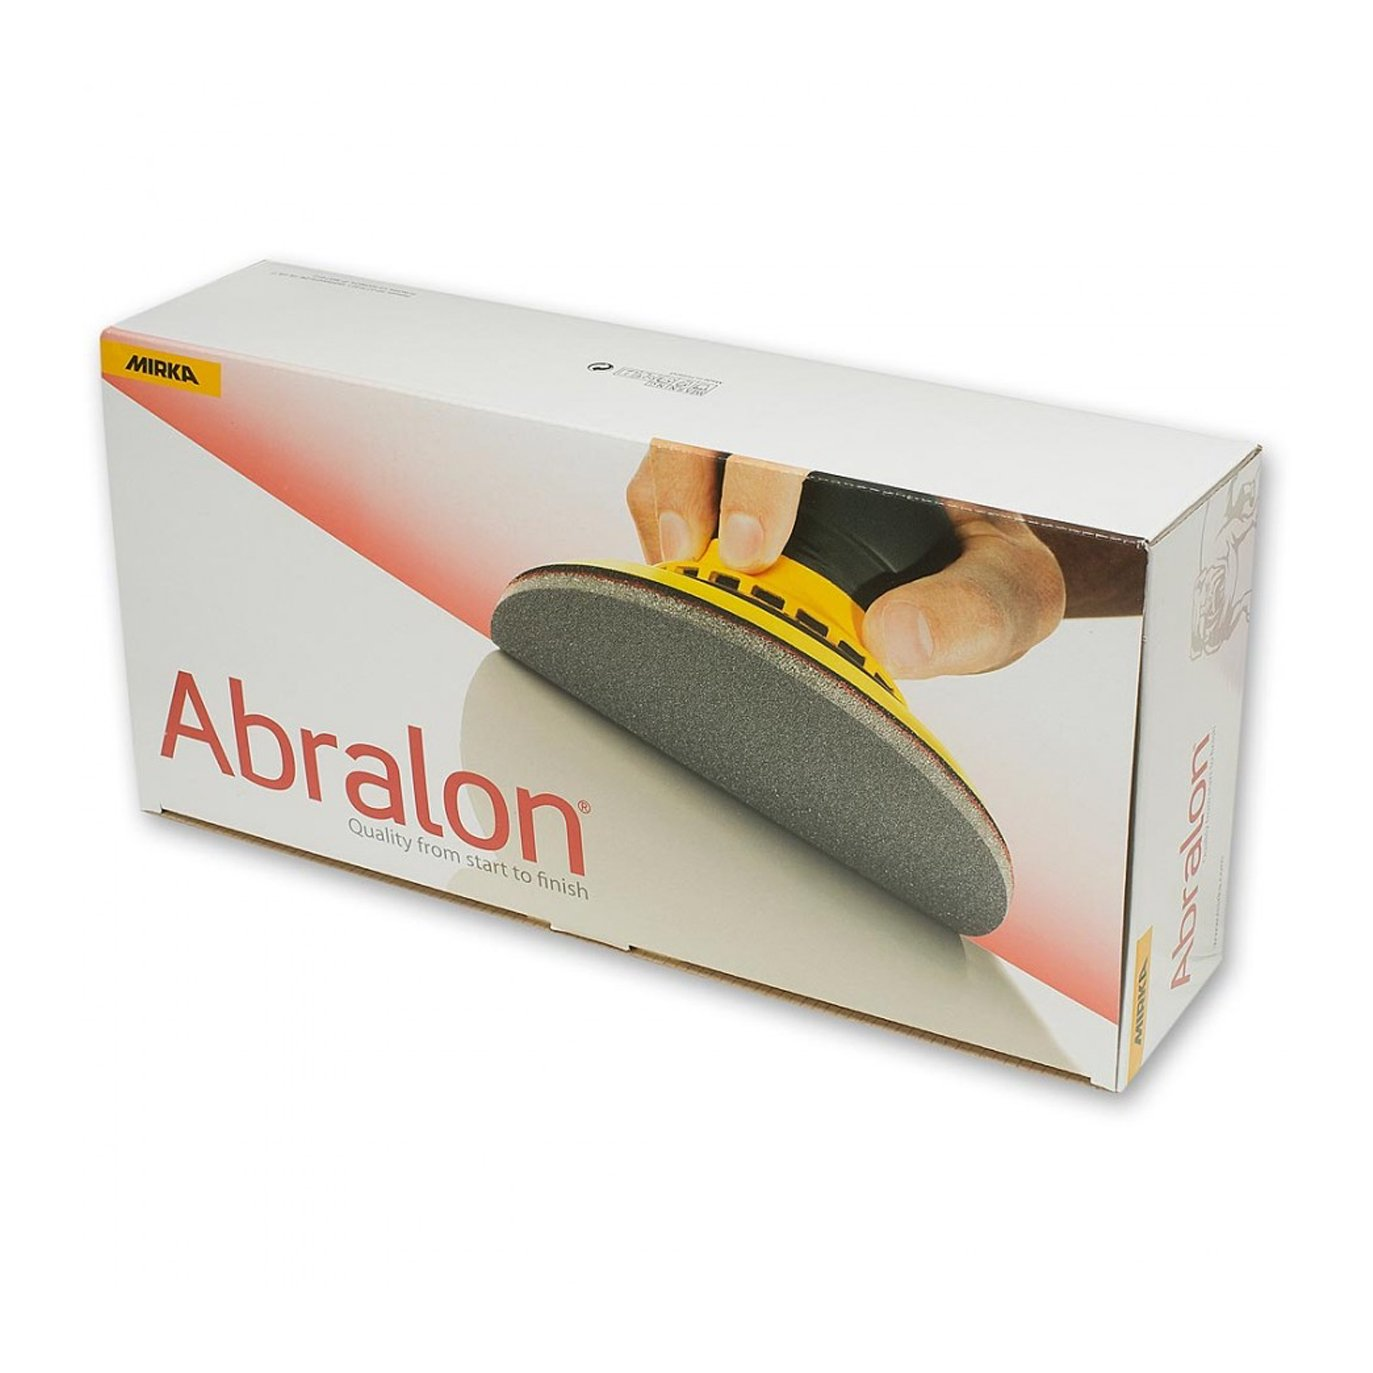 Image of Mirka Abralon Sanding Discs